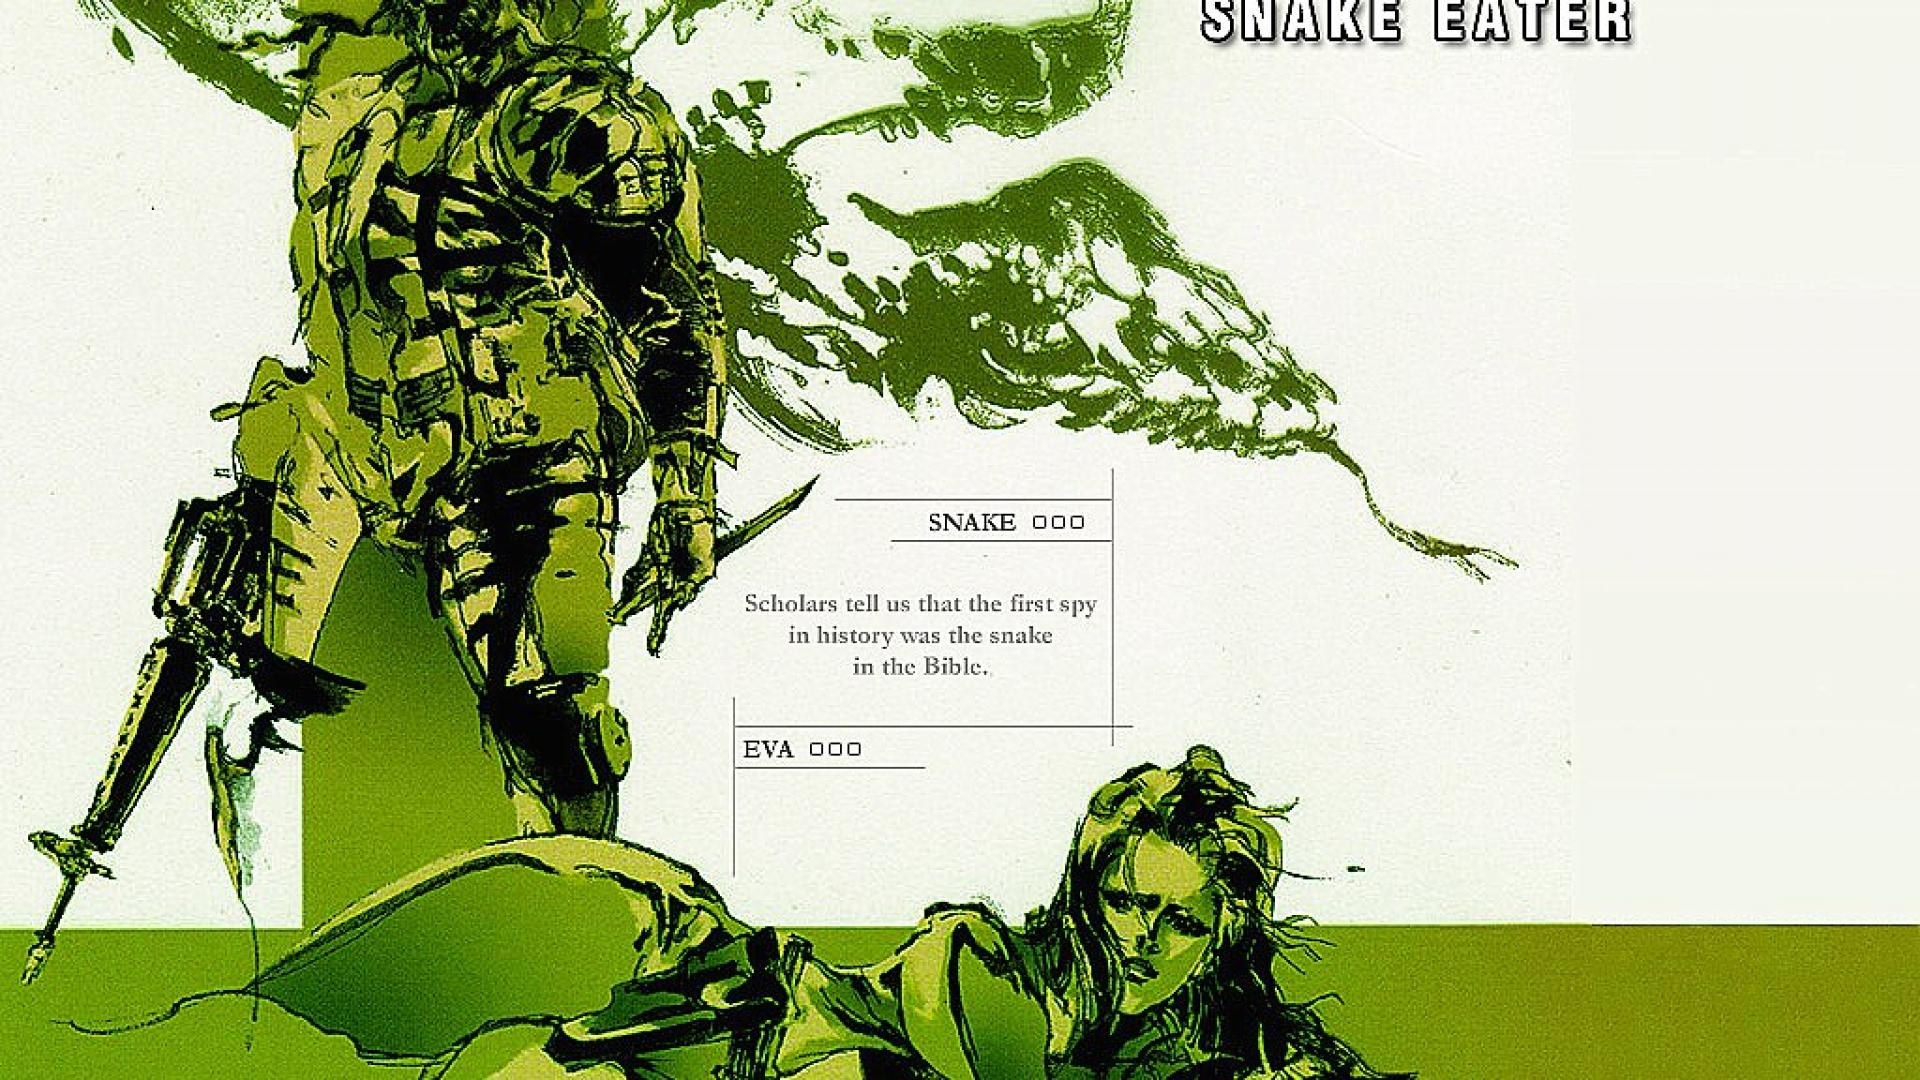 Free Download Snake Eater Metal Gear Solid Games Hd Wallpaper 9378